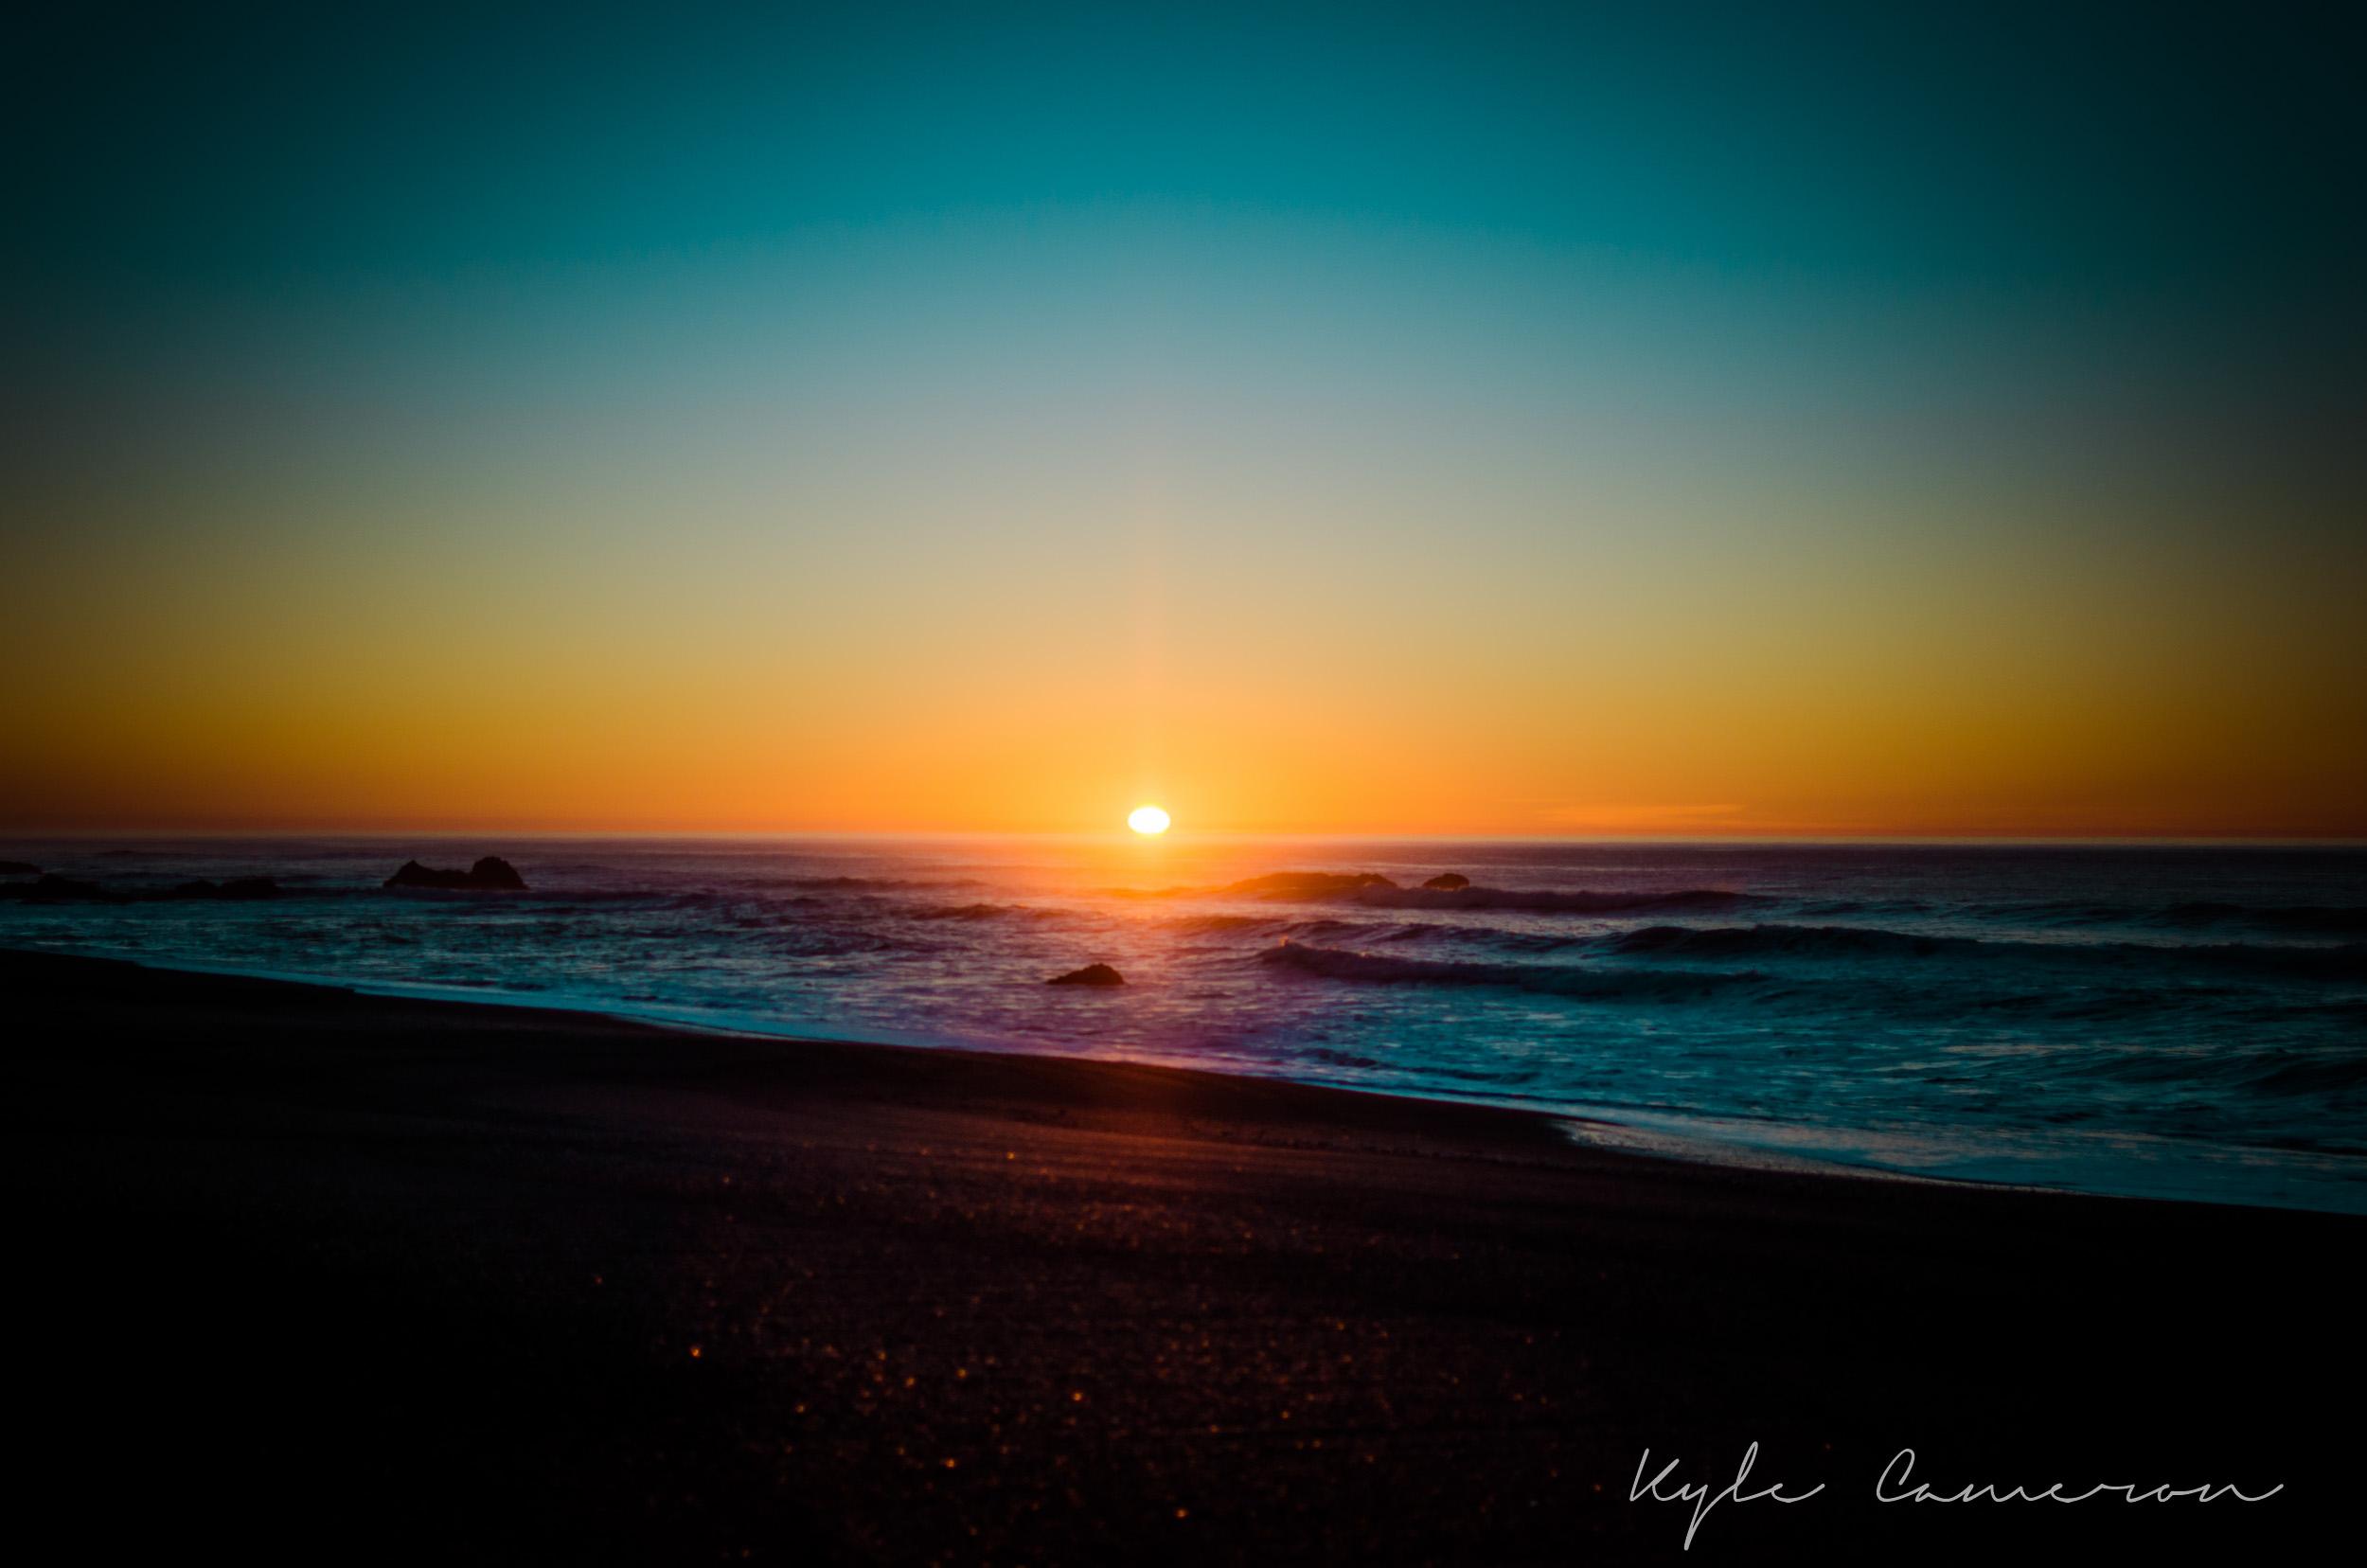 I do quite like sunsets